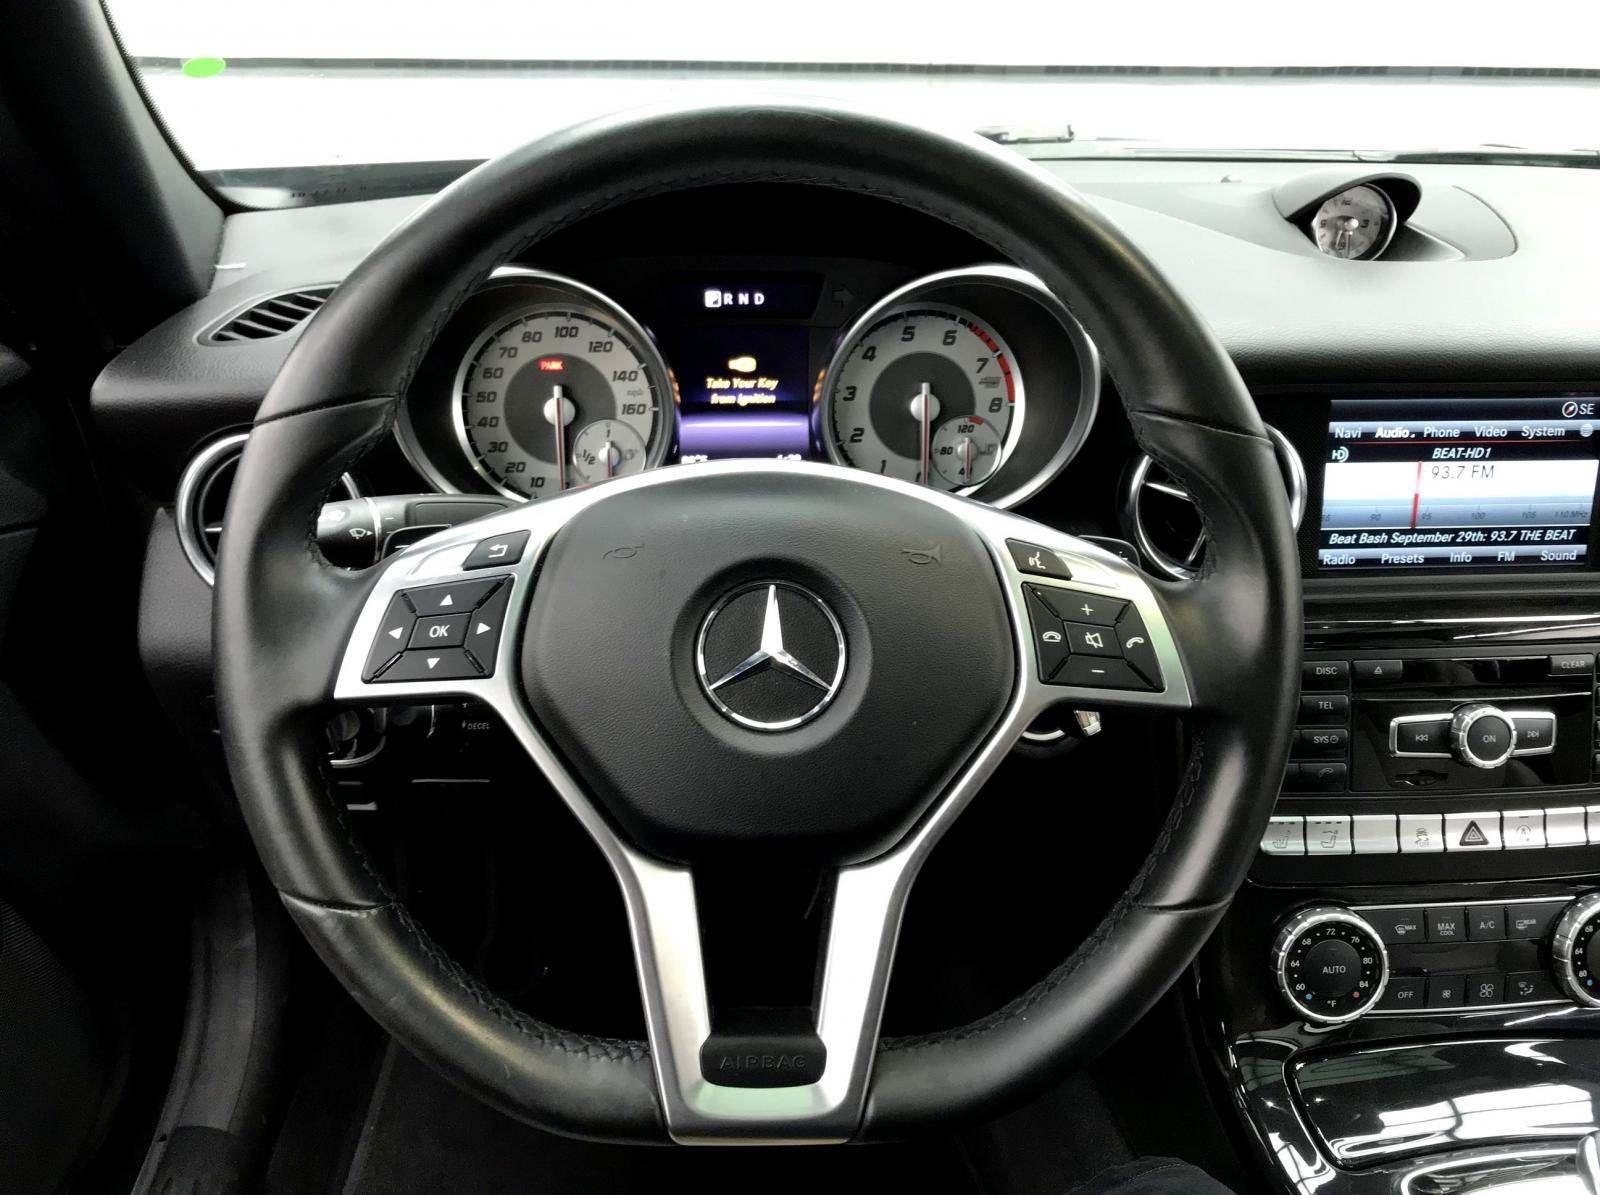 used Mercedes-Benz SLK-Class 2016 vin: WDDPK3JA1GF116189